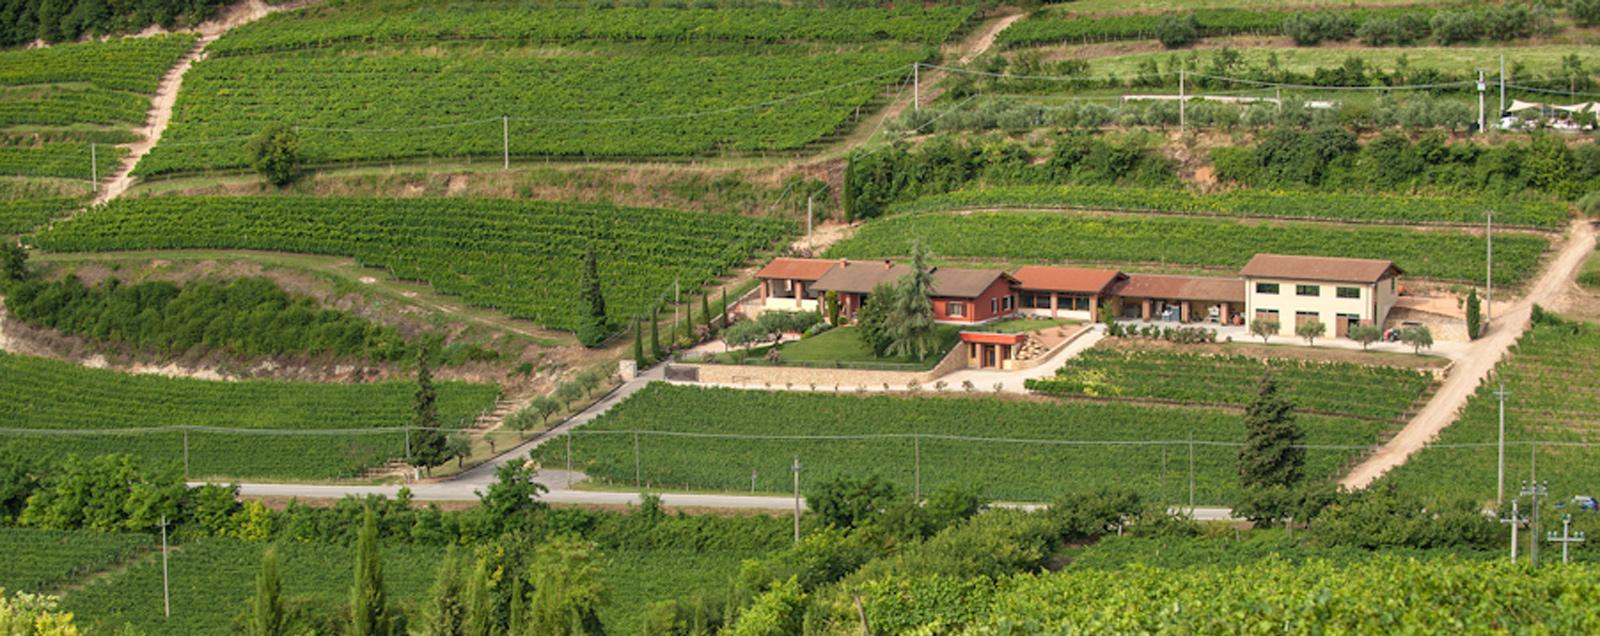 Corte Cavedini in Marcellise